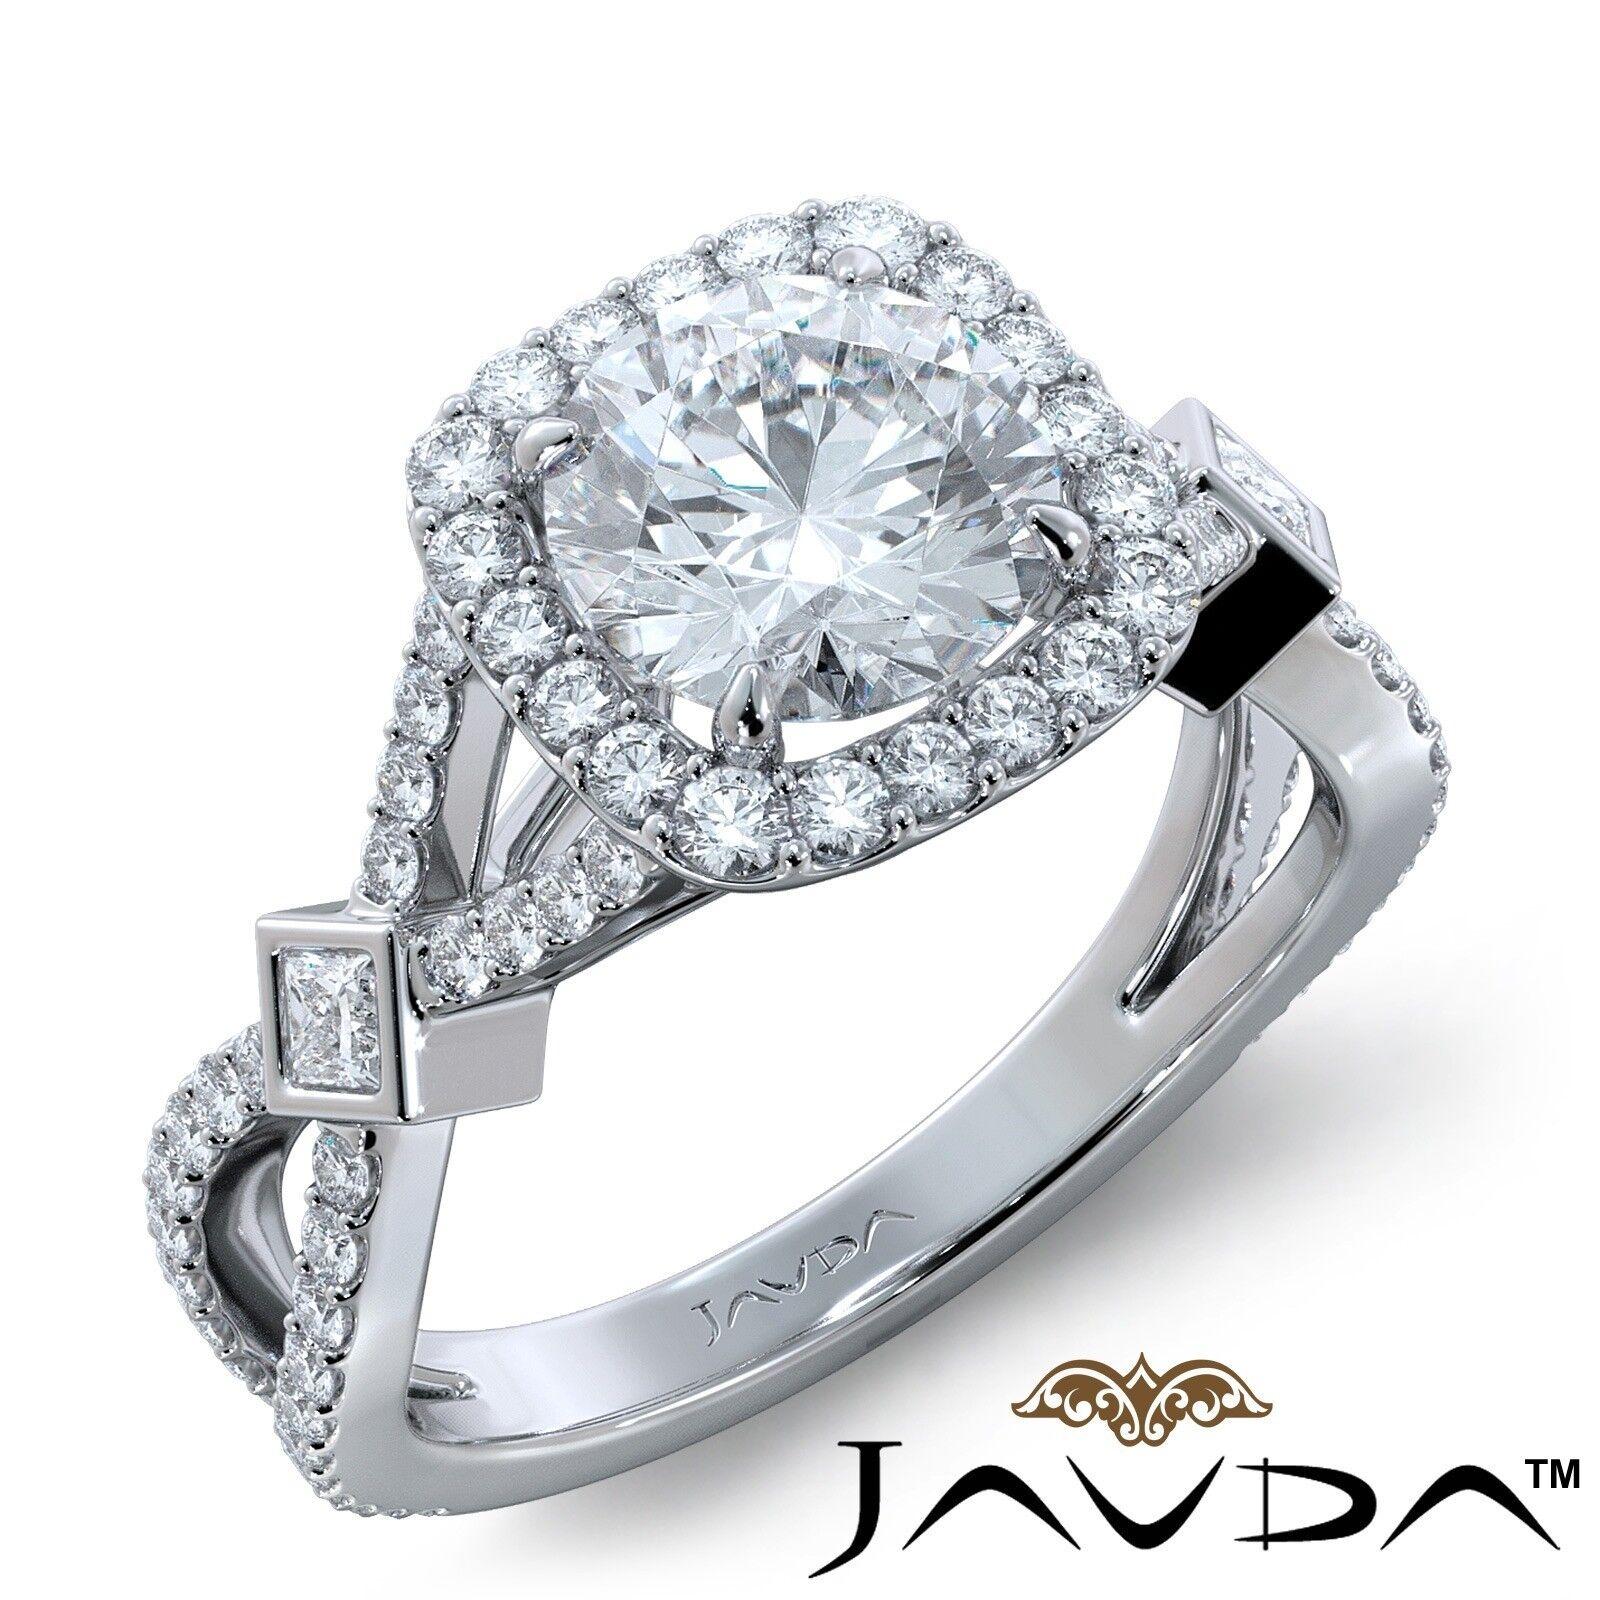 2.45ct Cross Shank Filigree halo Round Diamond Engagement Ring GIA F-VVS2 W Gold